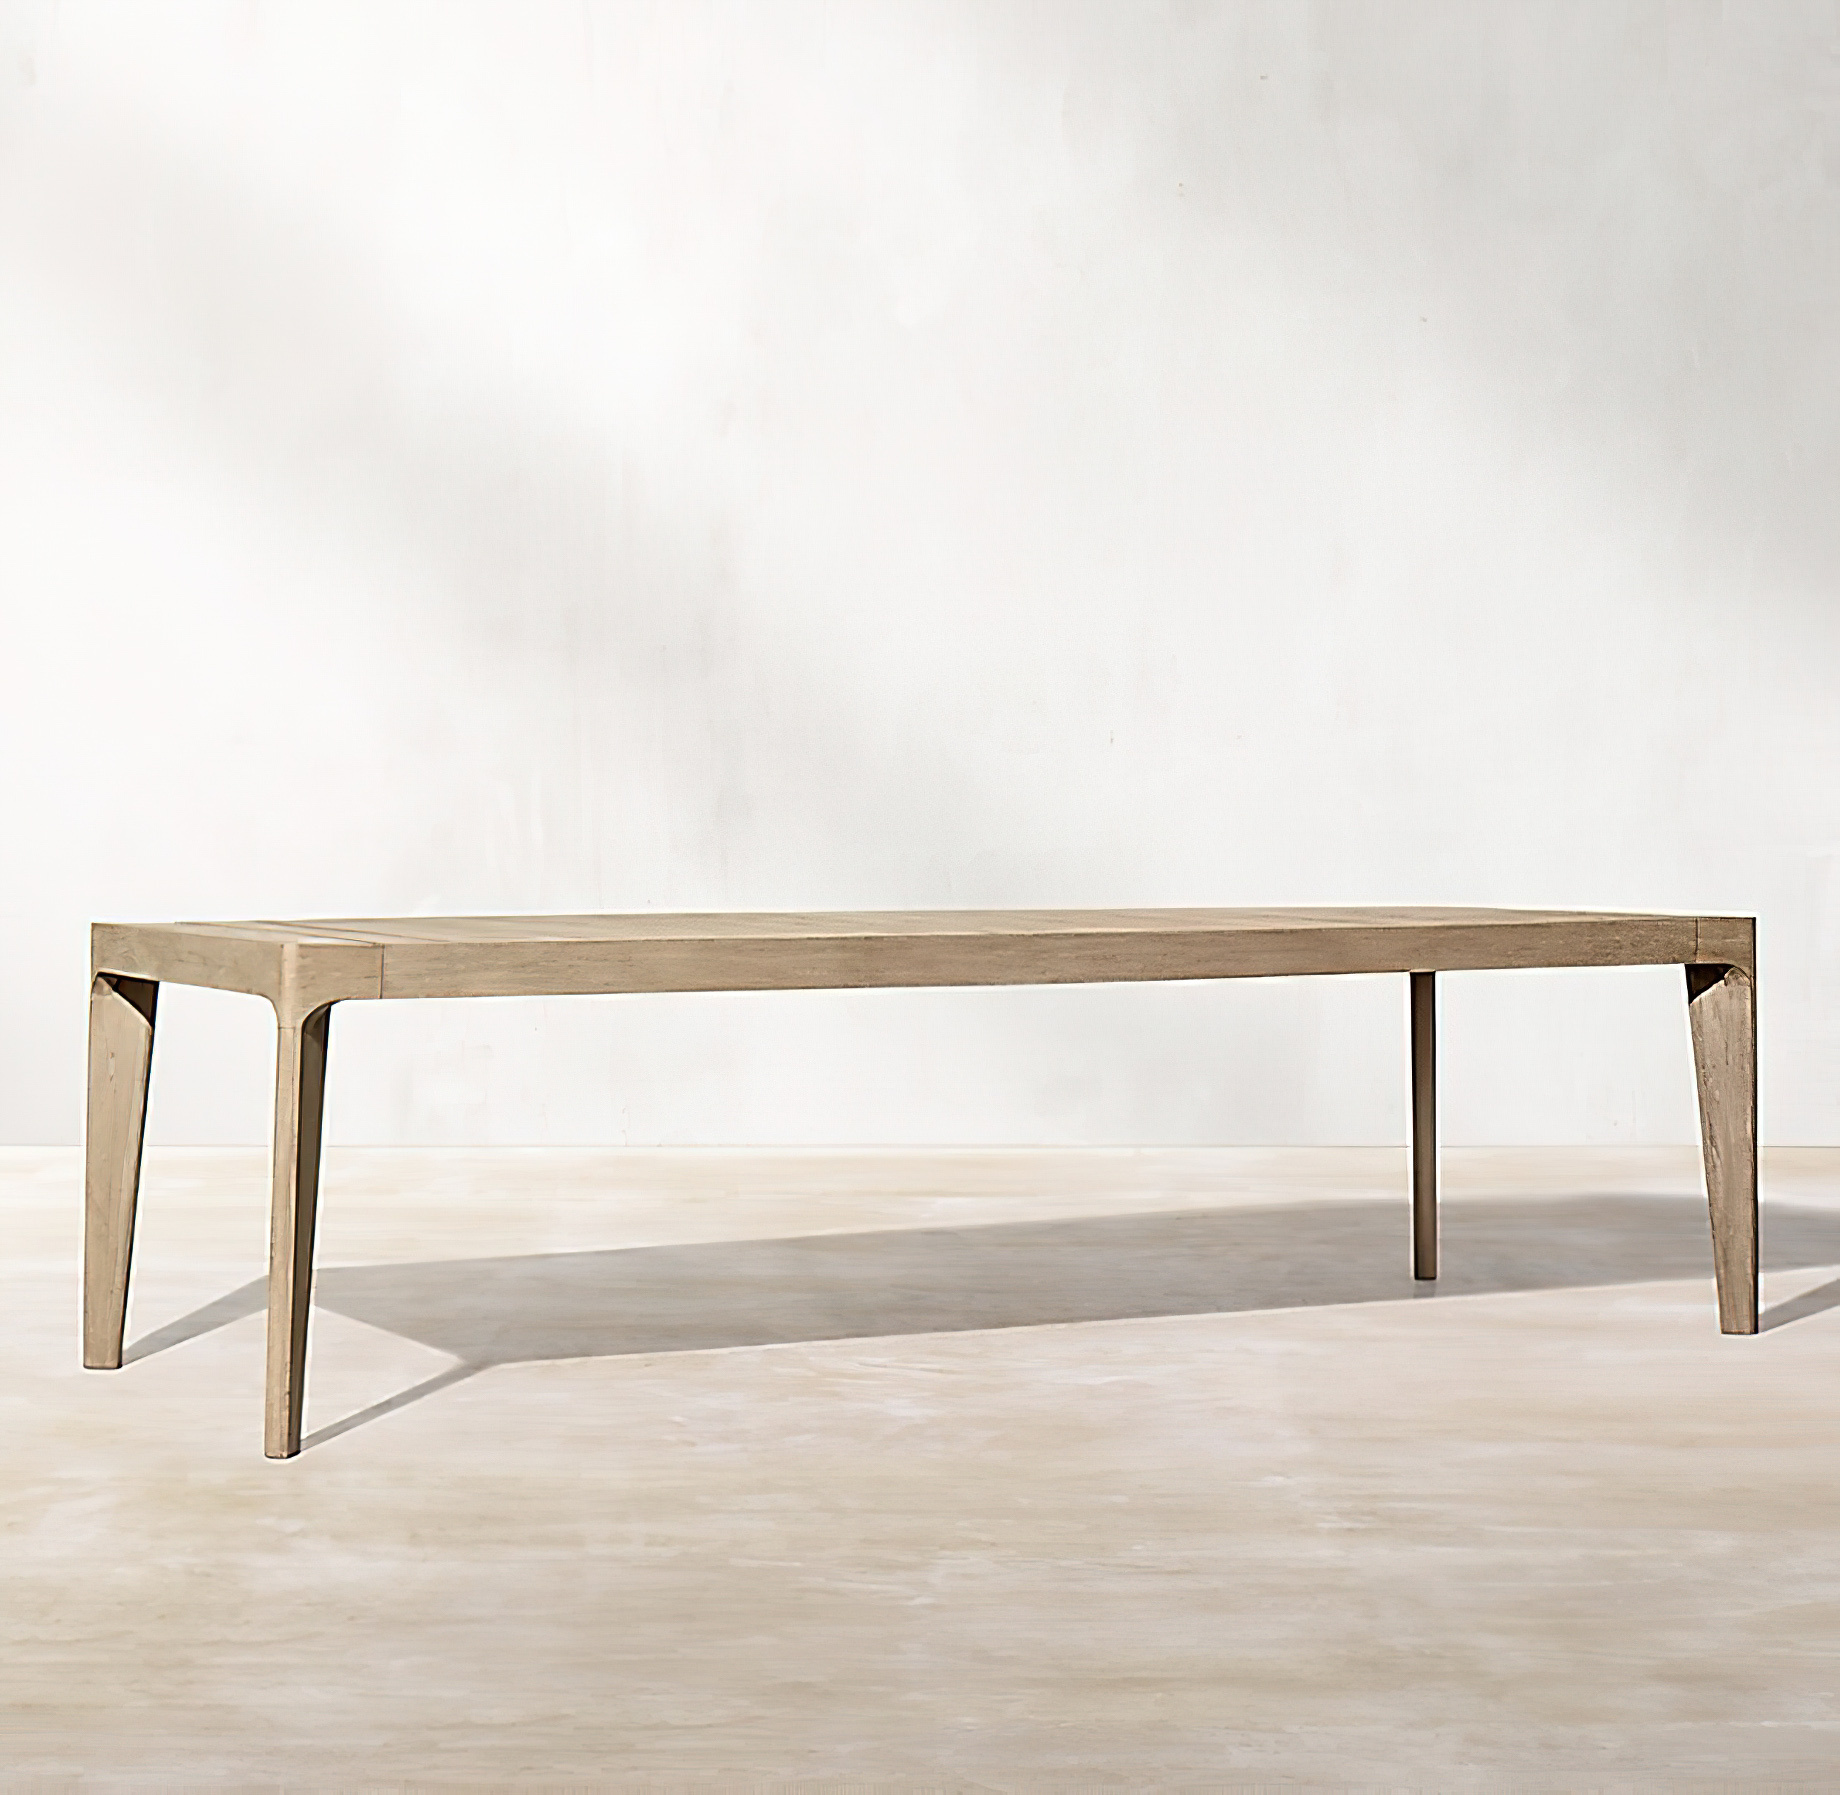 Malta Teak Collection Outdoor Furniture Design for RH - Ramon Esteve - Malta Teak Dining Table